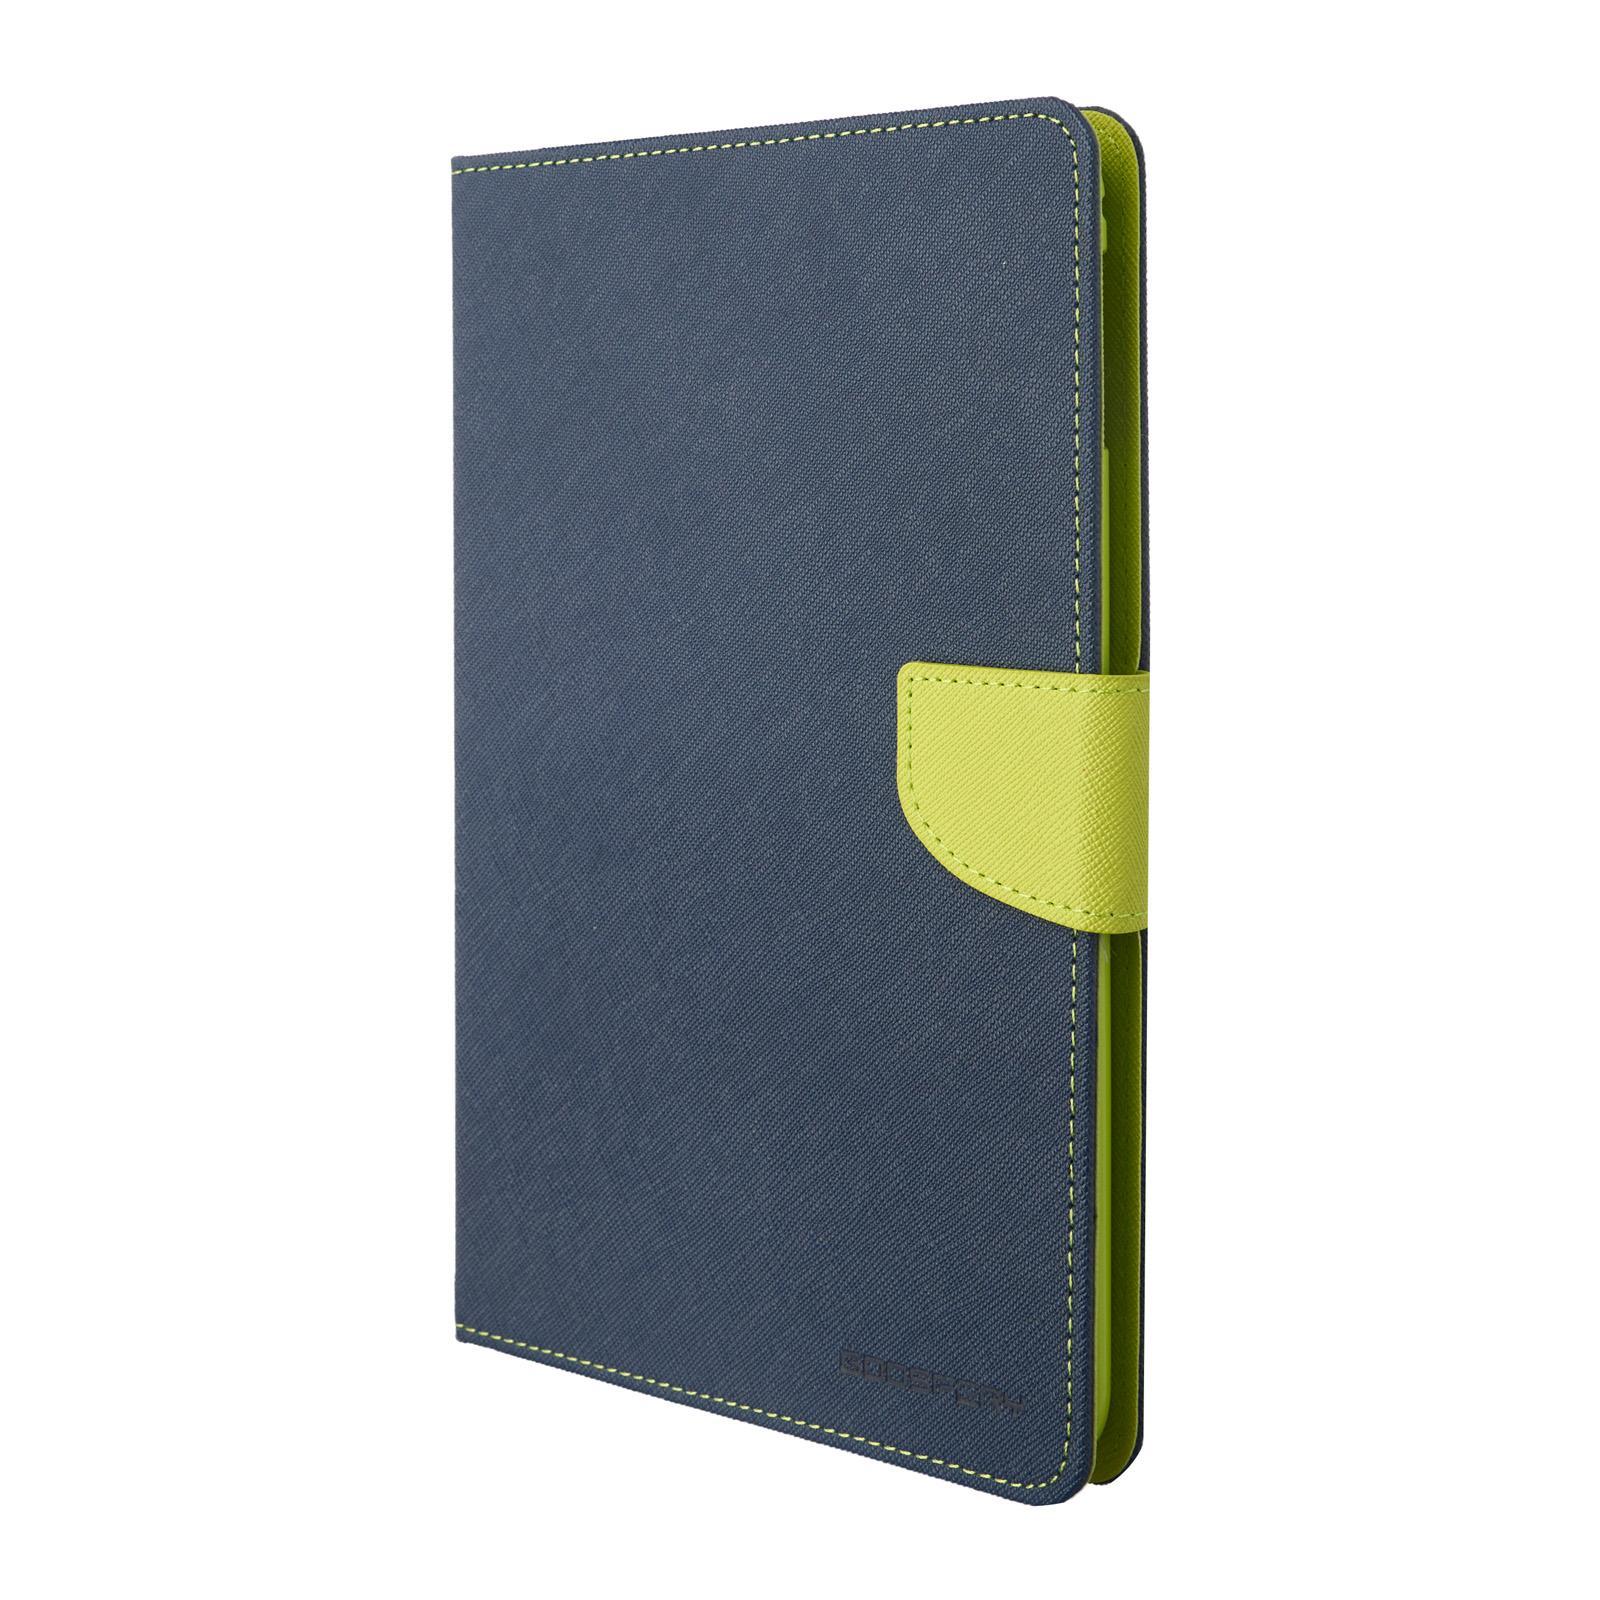 Pouzdro / kryt pro Apple iPad mini 4 - Mercury, Fancy Diary Navy/Lime